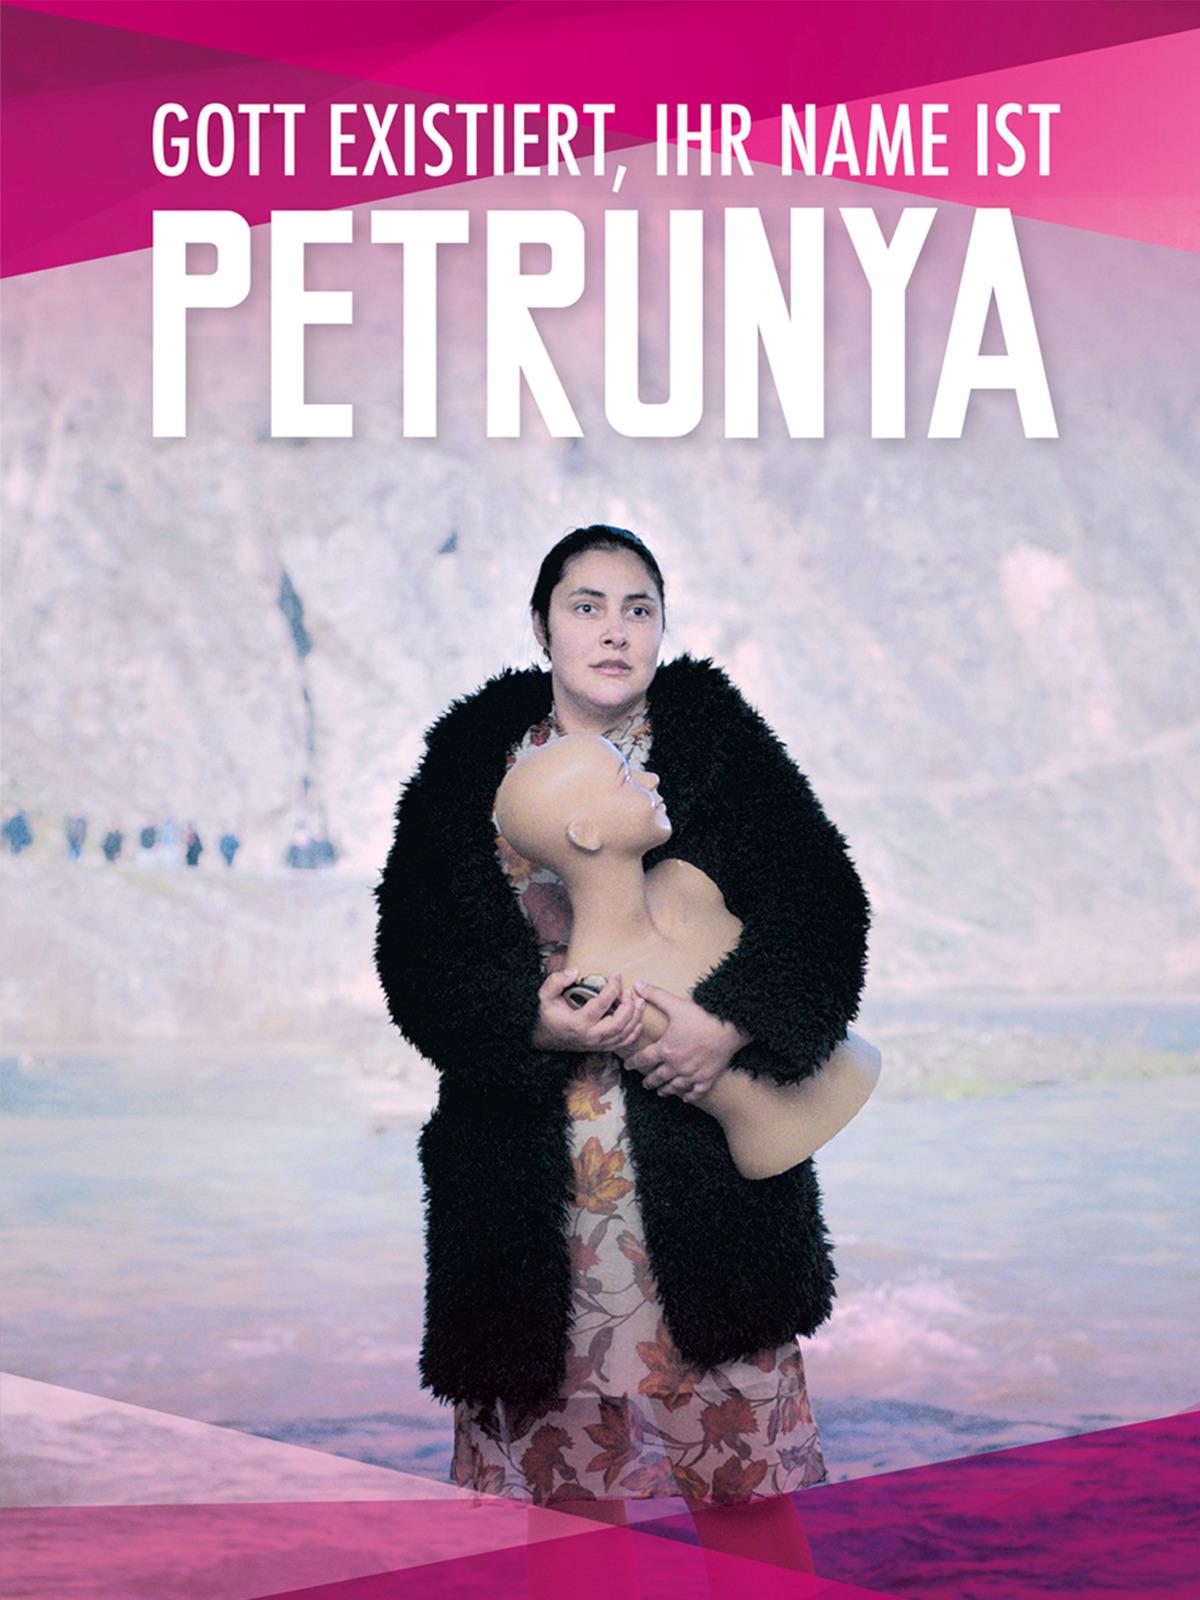 Gott existiert, ihr Name ist Petrunya